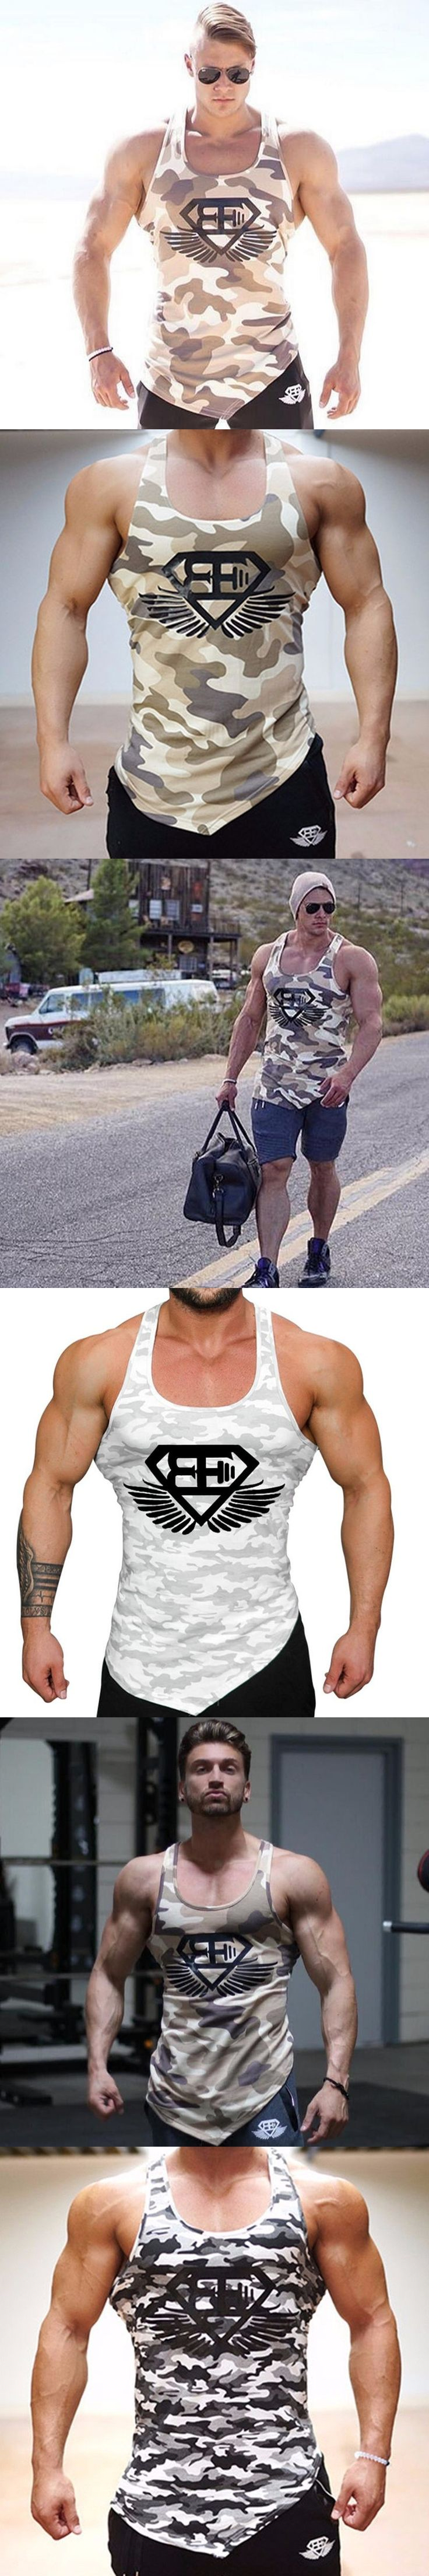 Men fitness bodybuilding Tank tops gyms workout Sleeveless shirt male Camouflage vest Casual golds Singlet sportswear Undershirt